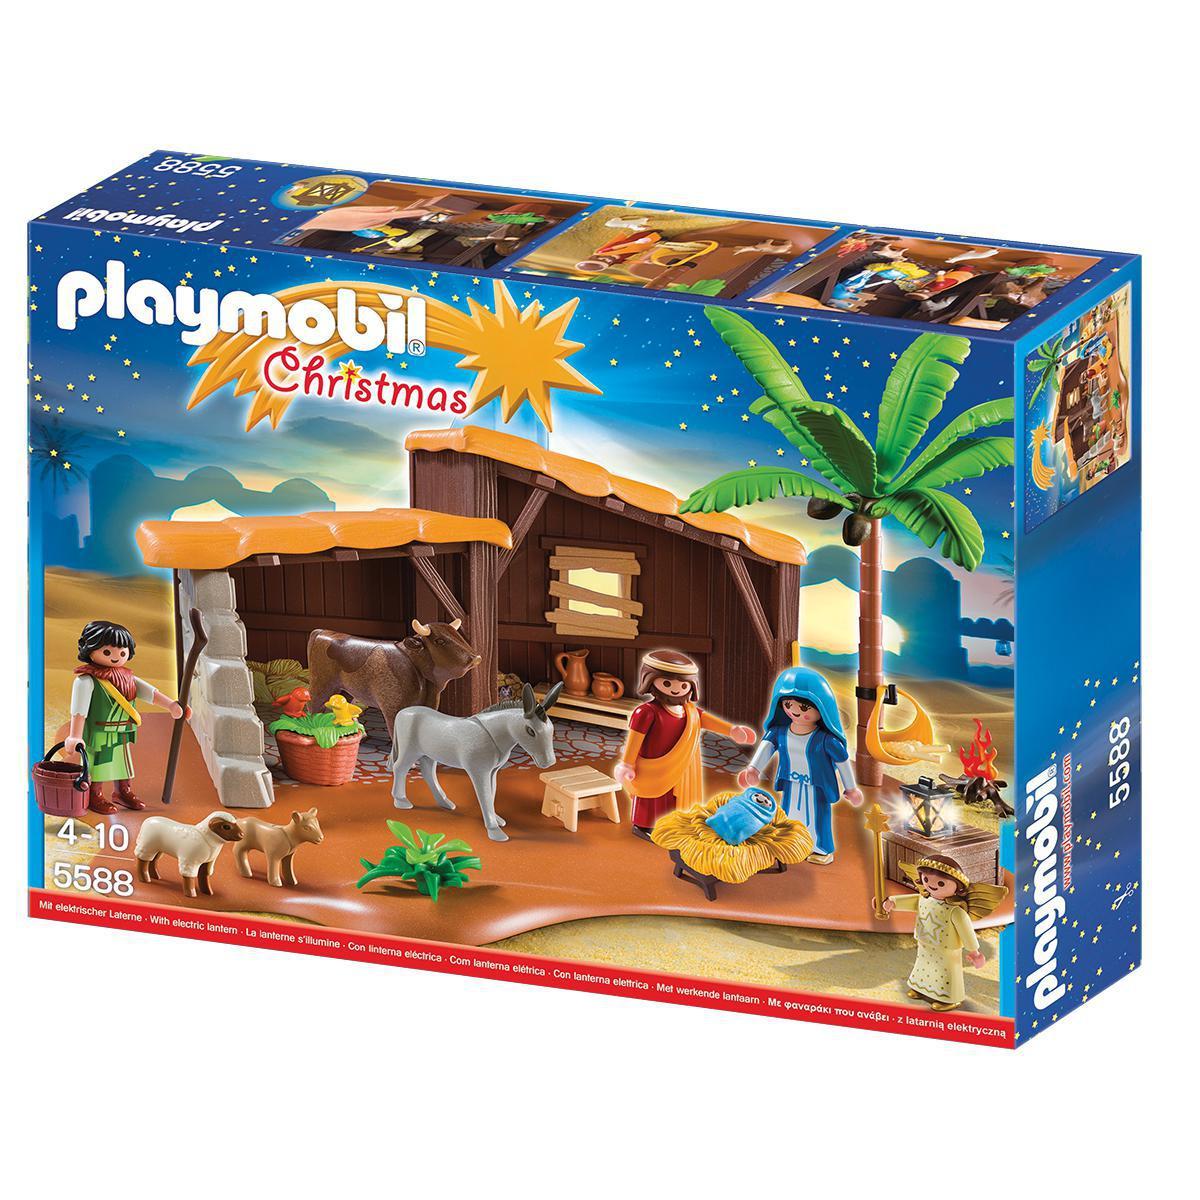 Playmobil® Nativity Set